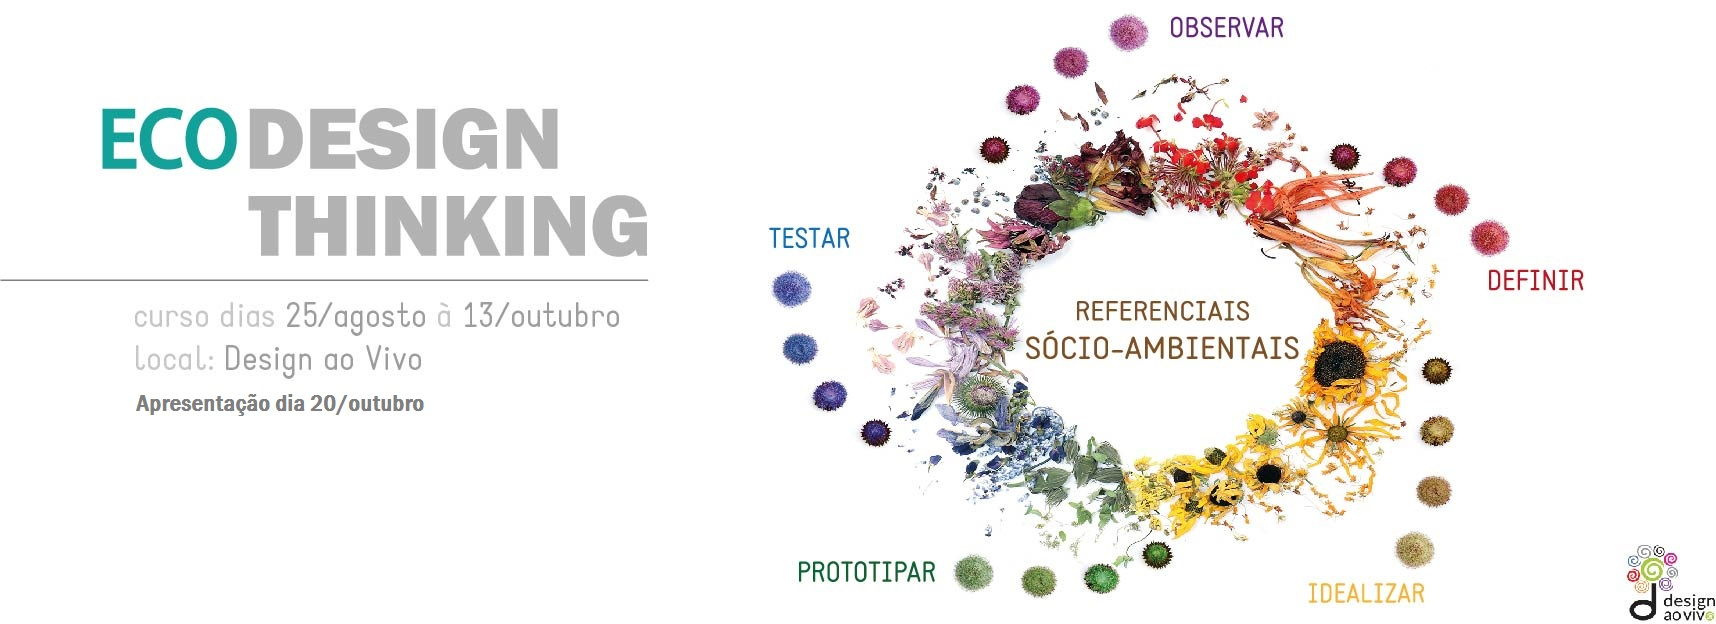 Ecodesign Thinking Metodologia 1740x470px rev 2.jpg